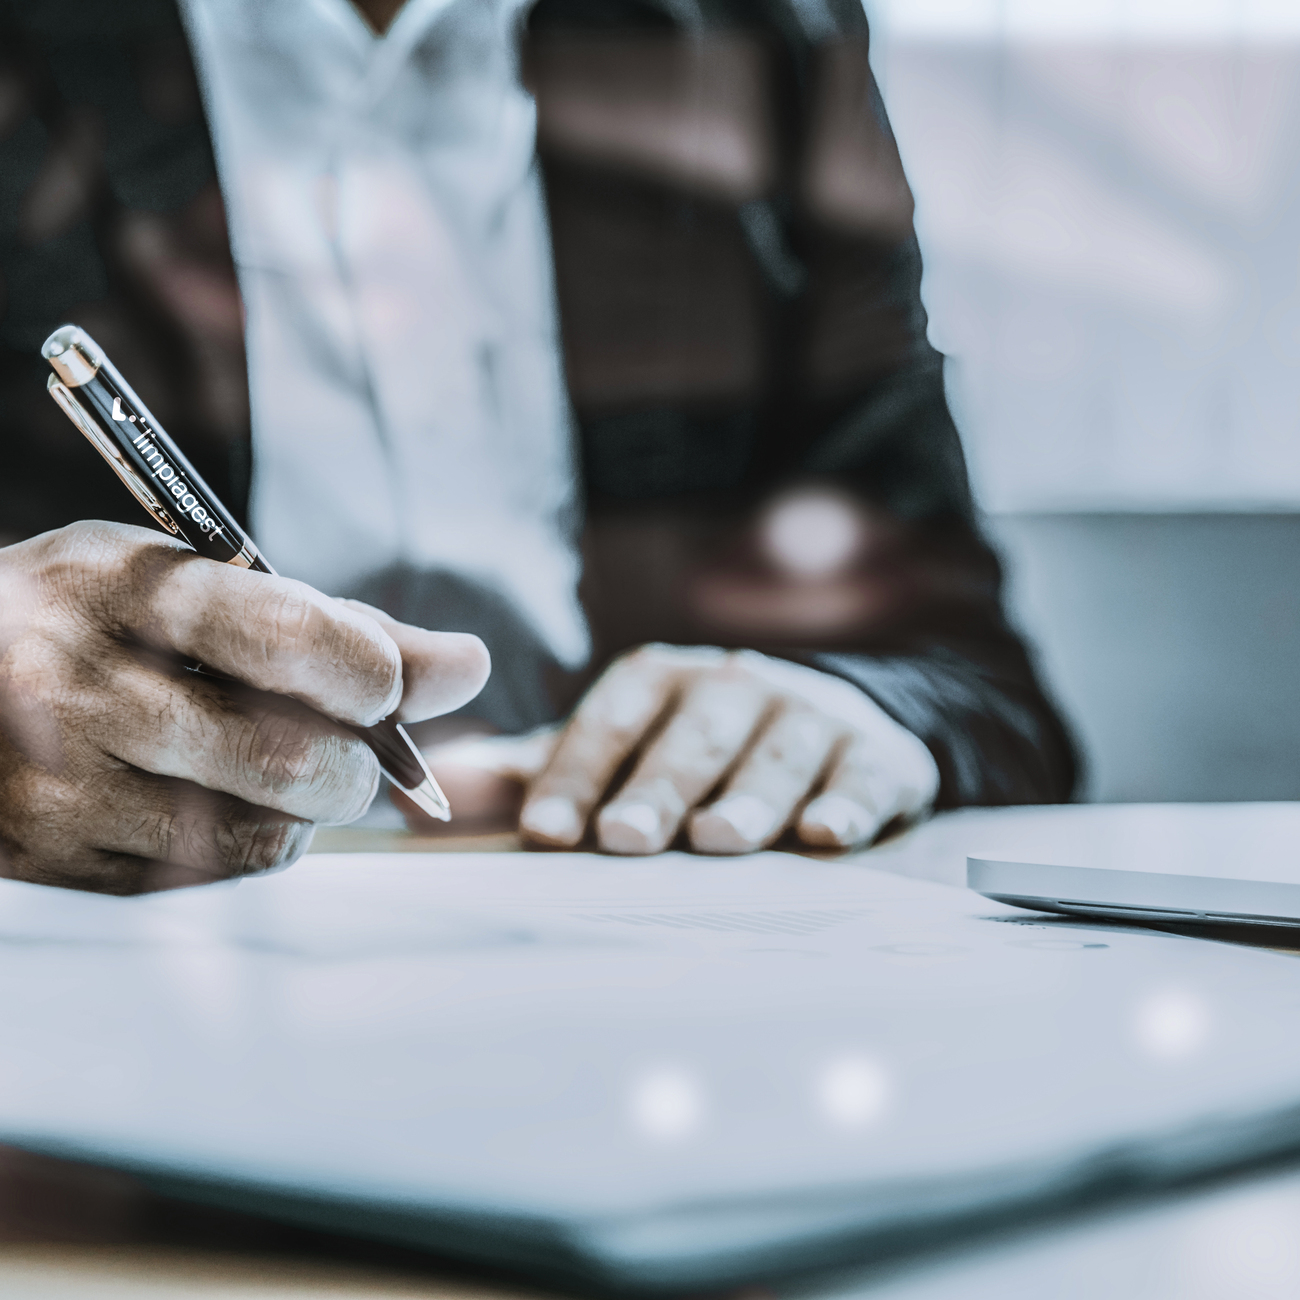 Limpiagest® Gestione Impianti Trattamento Rifiuti in Outsourcing Intermediazione Rifiuti Interna